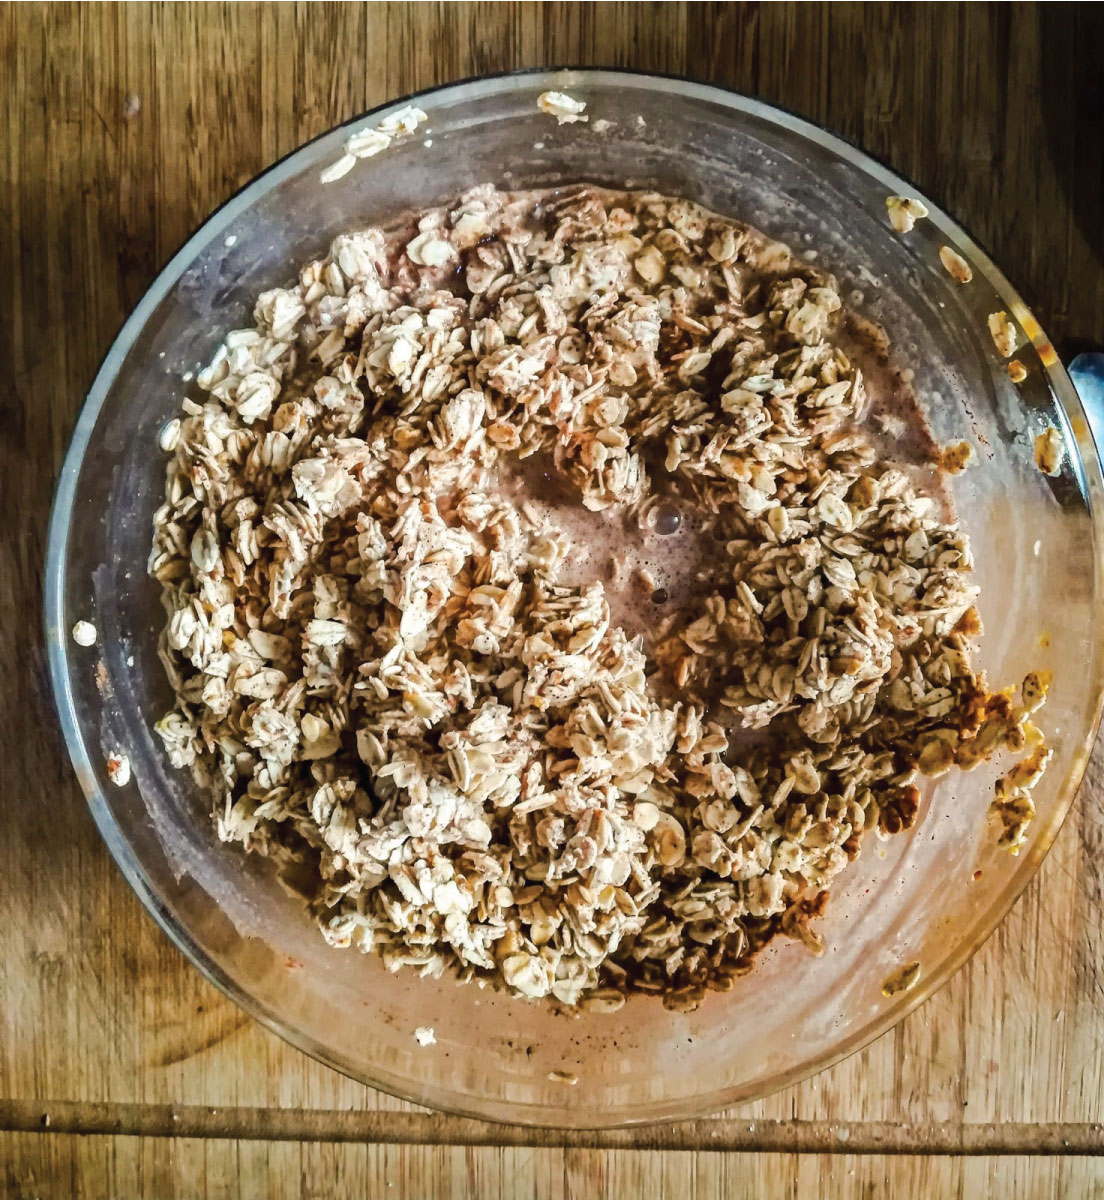 Ramona debono Baked Oats vegan recipe